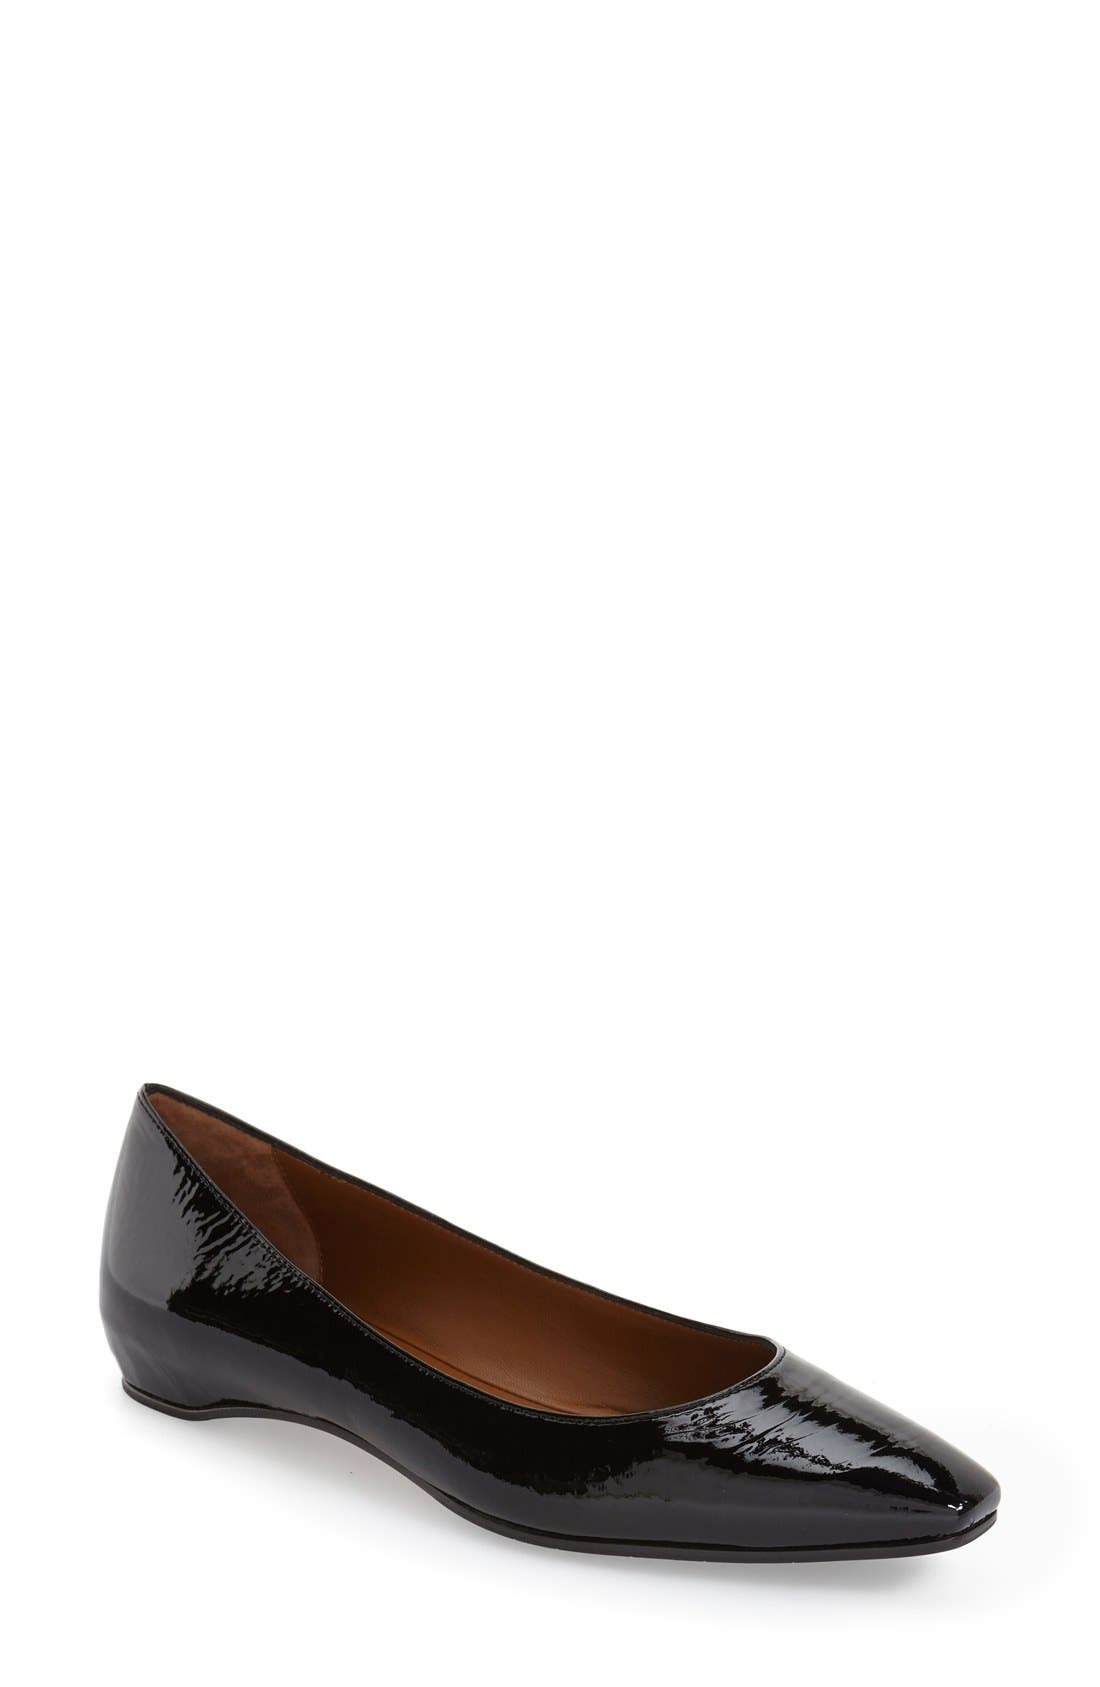 Alternate Image 1 Selected - Aquatalia Marcella Weatherproof Leather Flat (Women)